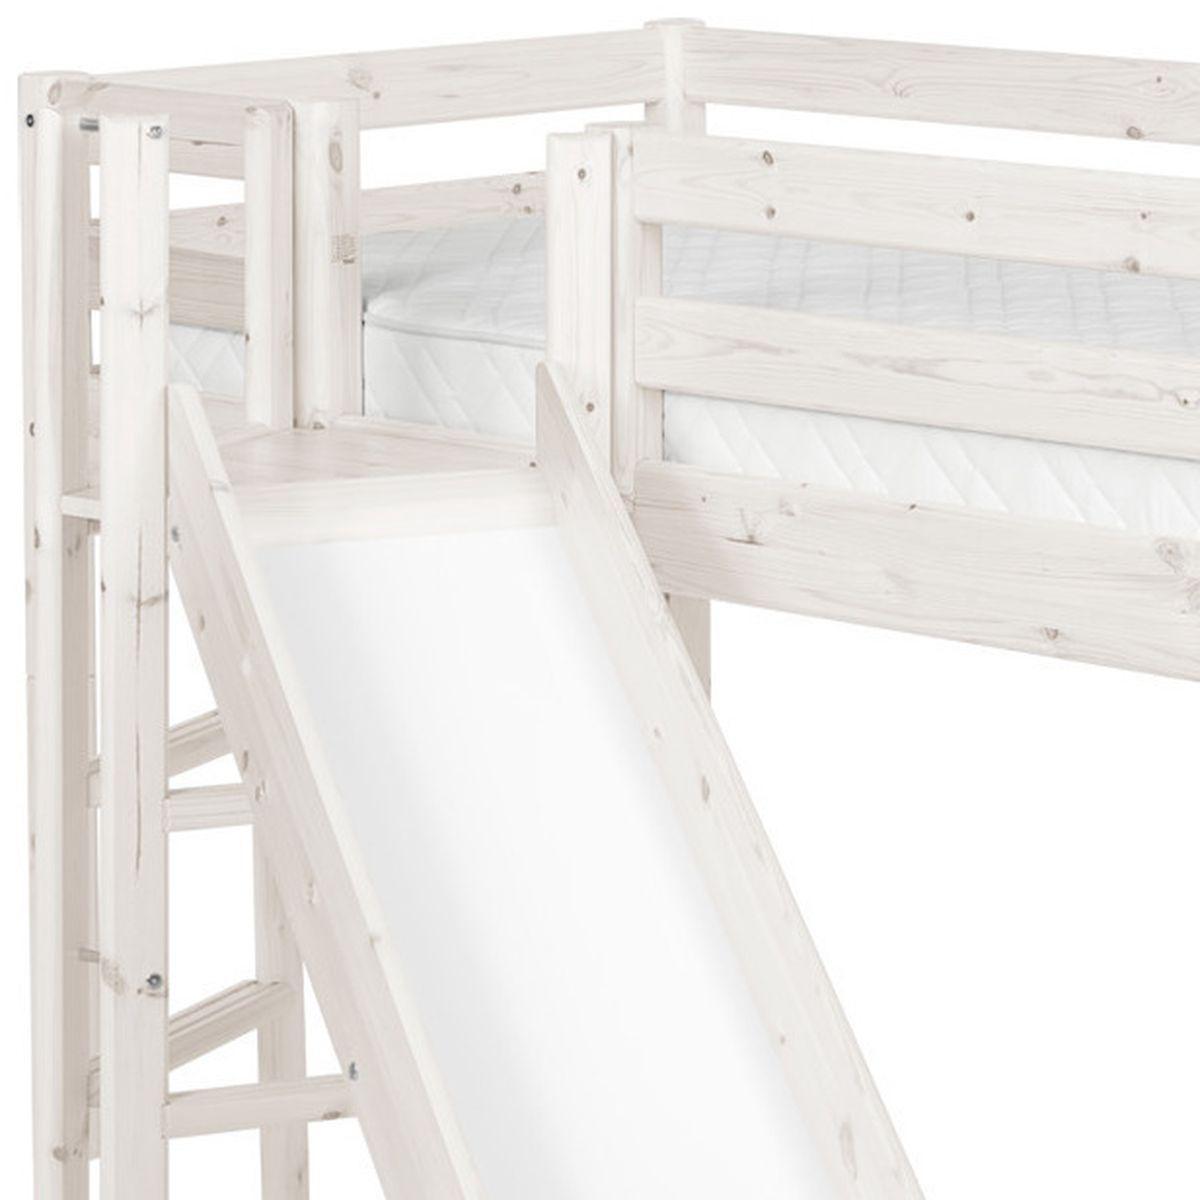 Lit mi-hauteur Classic Line 90x190 cm + plate-forme + toboggan by Flexa